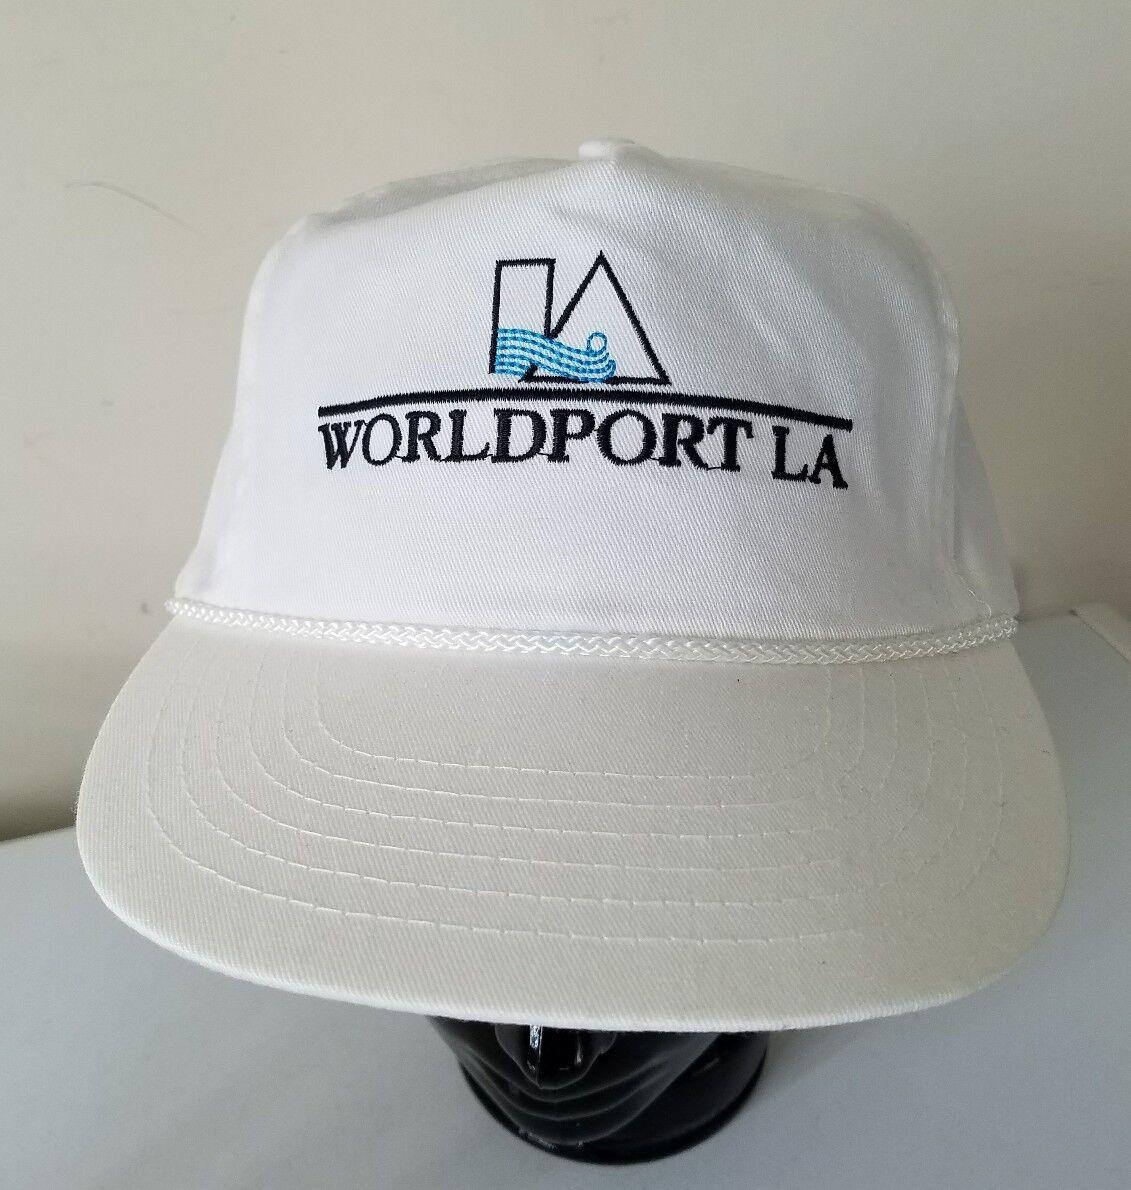 Worldport Embroidered LA Los Angeles Vintage Embroidered Worldport Logo Snapback Baseball Hat Cap 65c02e